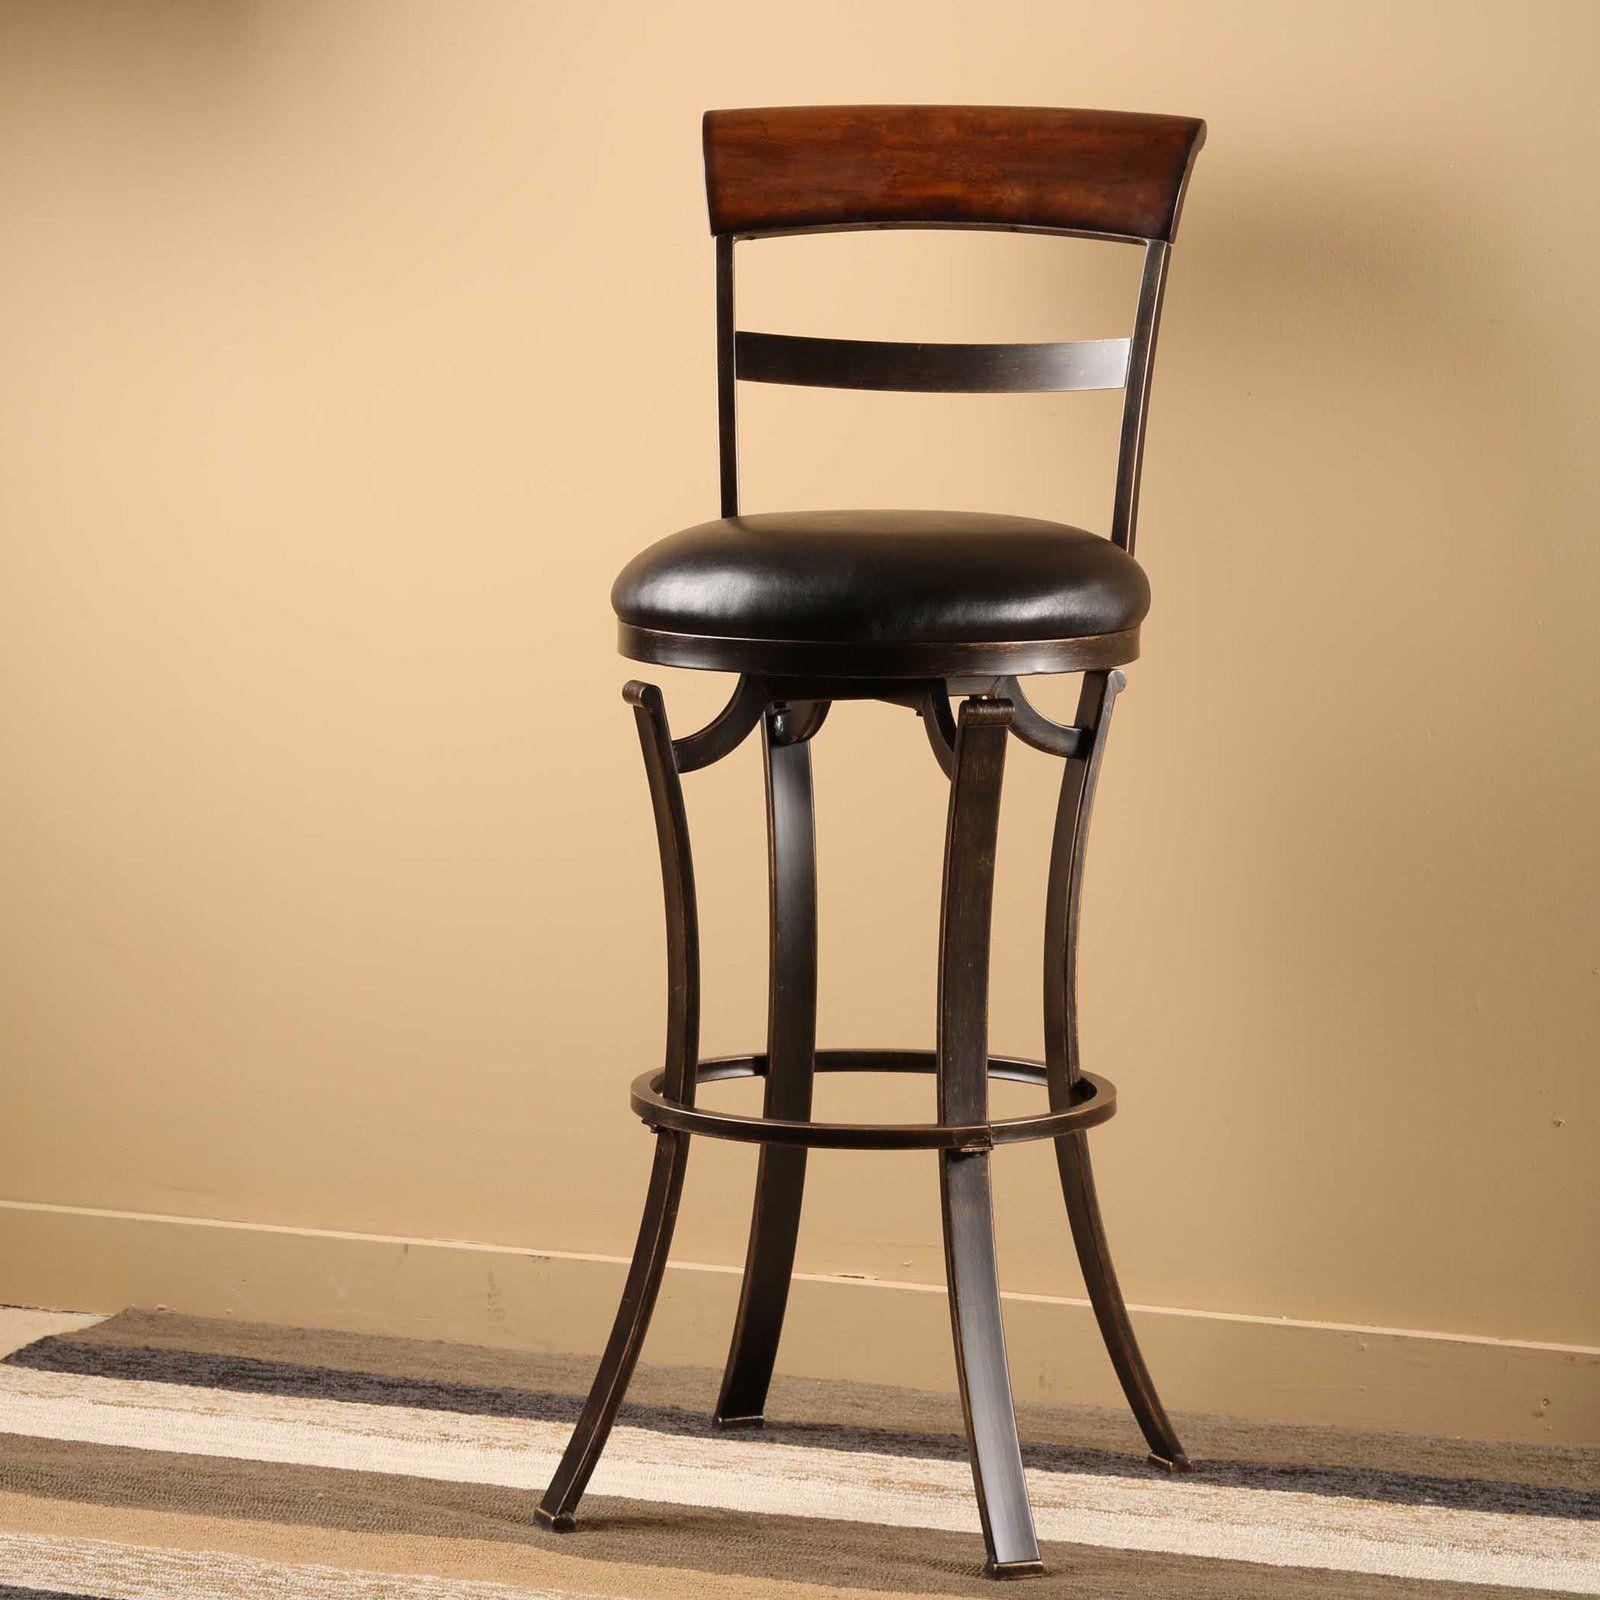 Hillsdale Furniture Kennedy Swivel Counter Stool Swivel Bar Stools Bar Stools Swivel Counter Stools